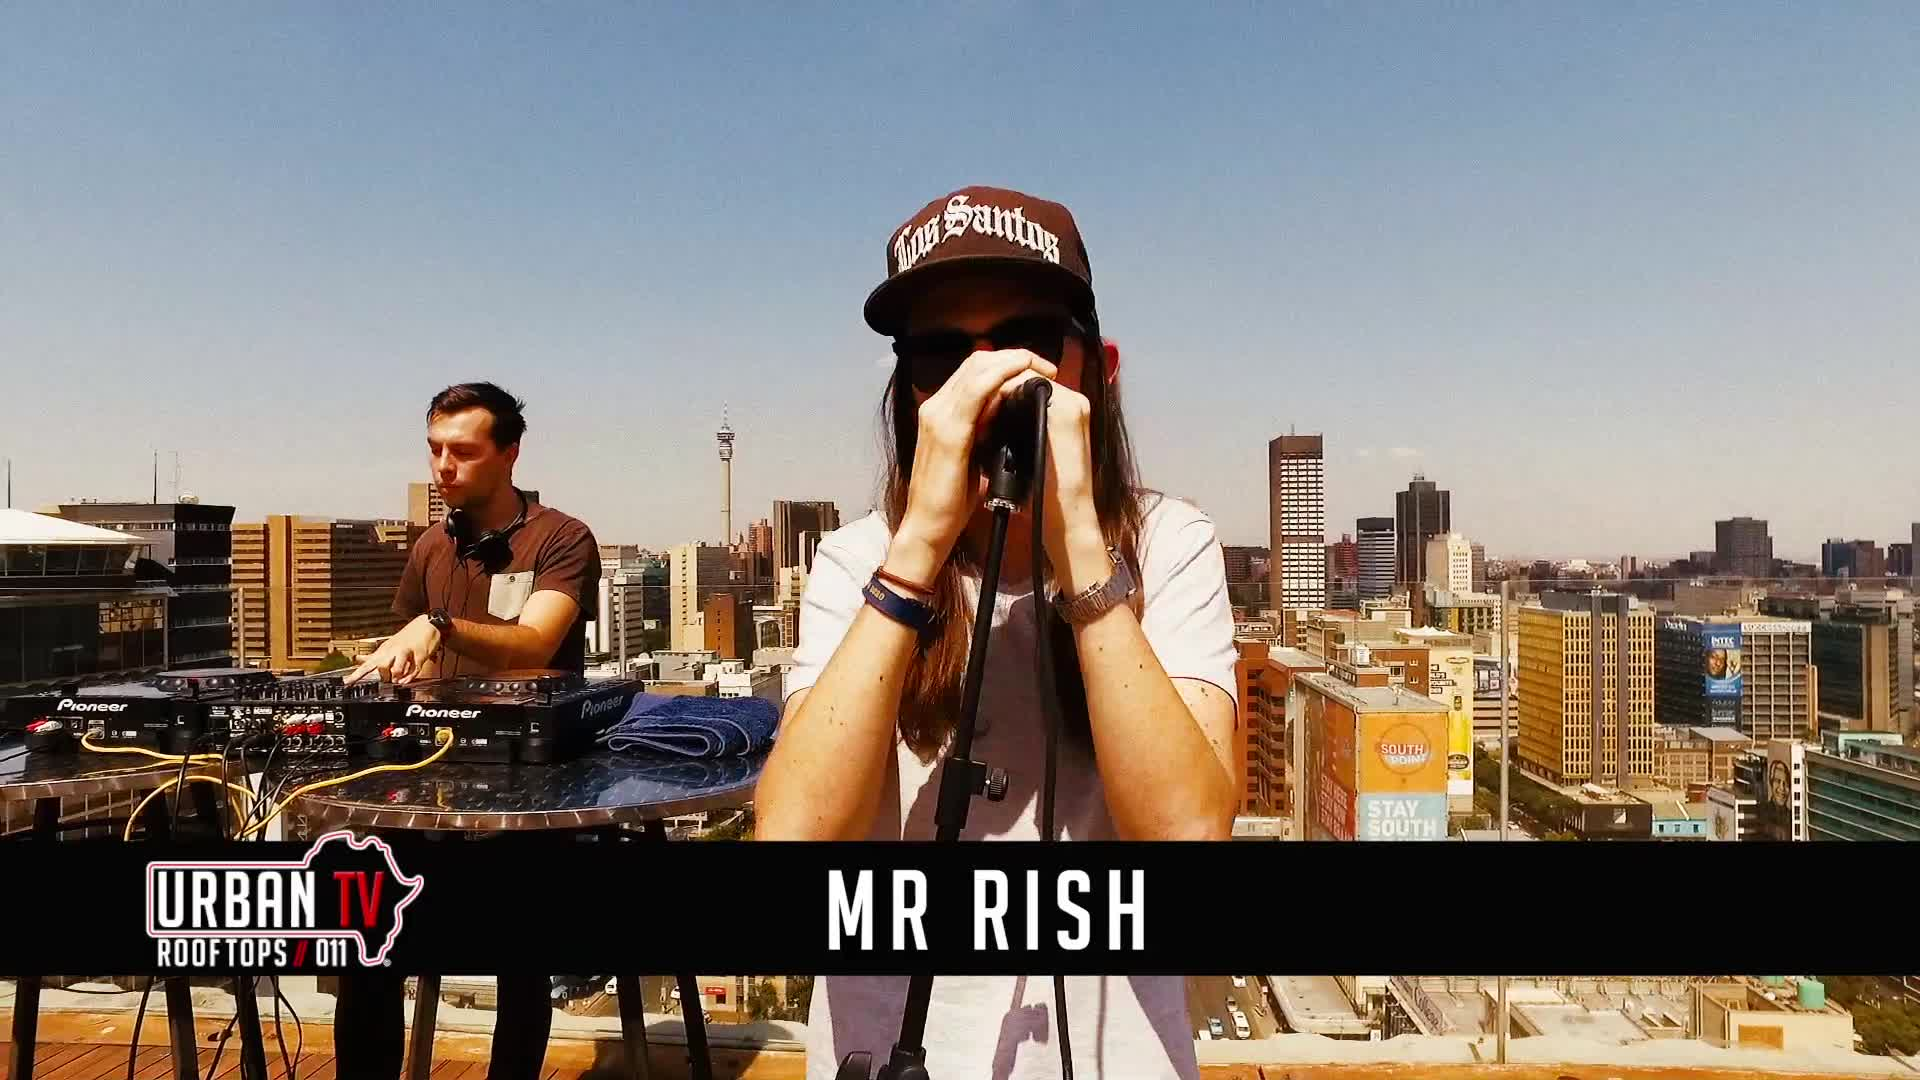 Urban Rooftops 011 - Mr Rish